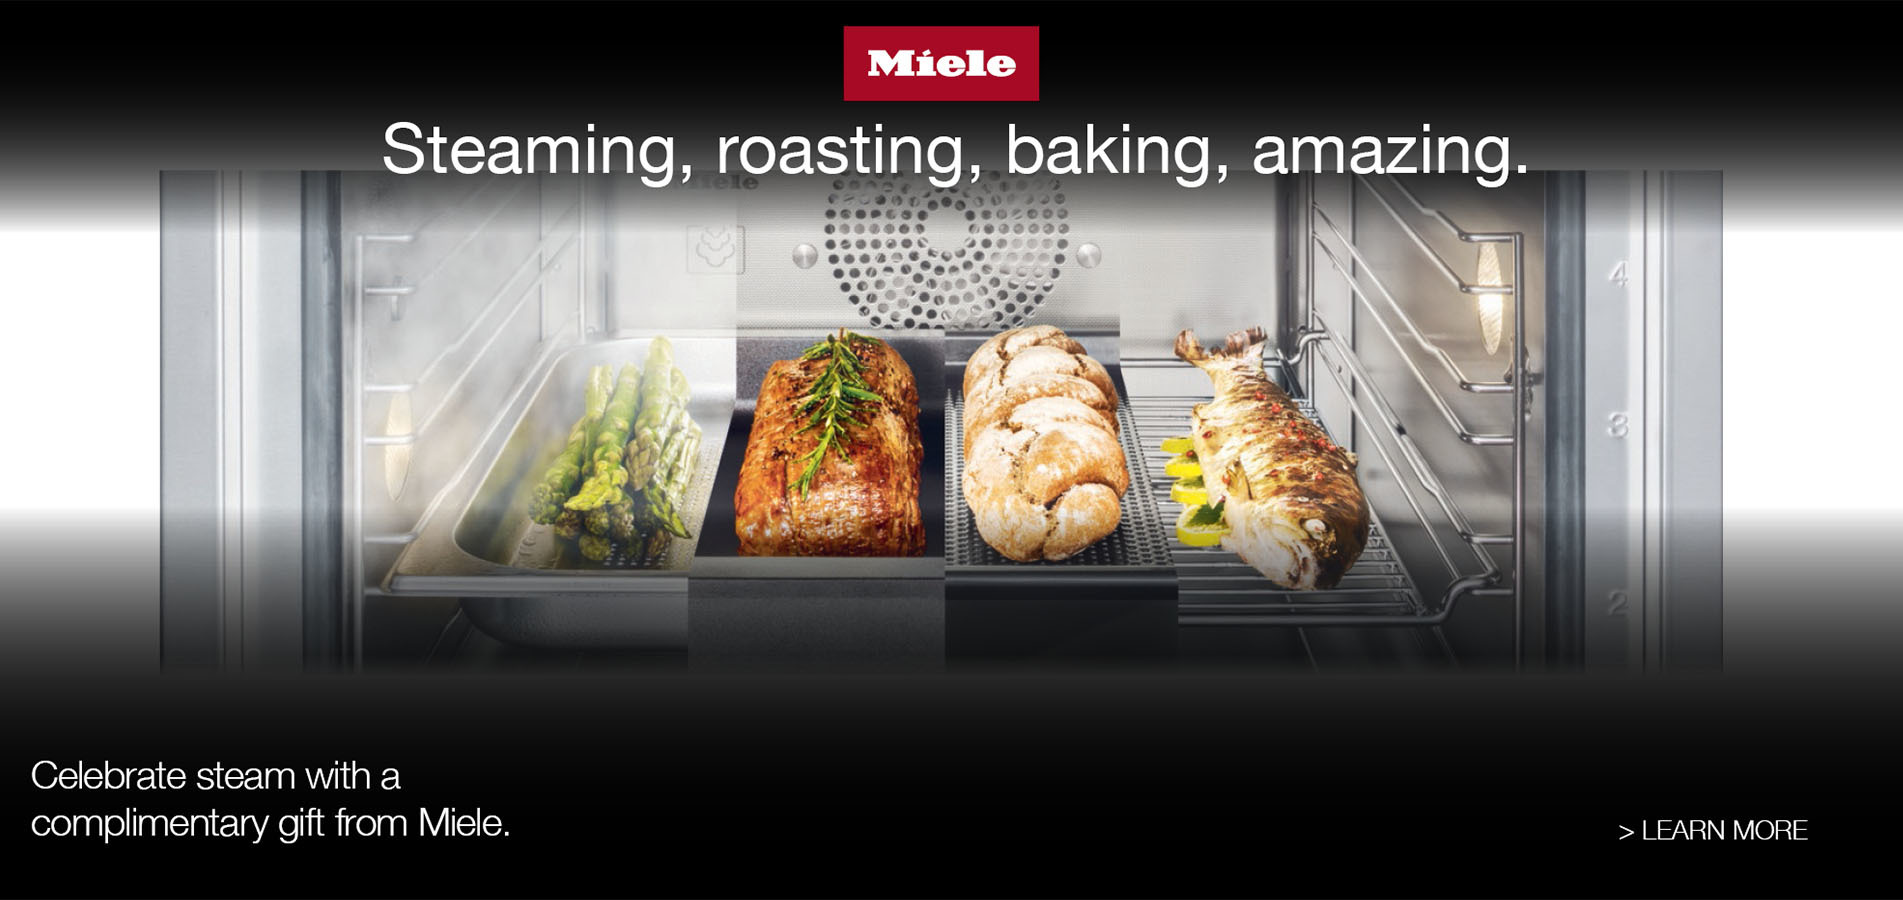 The Miele Combi-Steam Oven